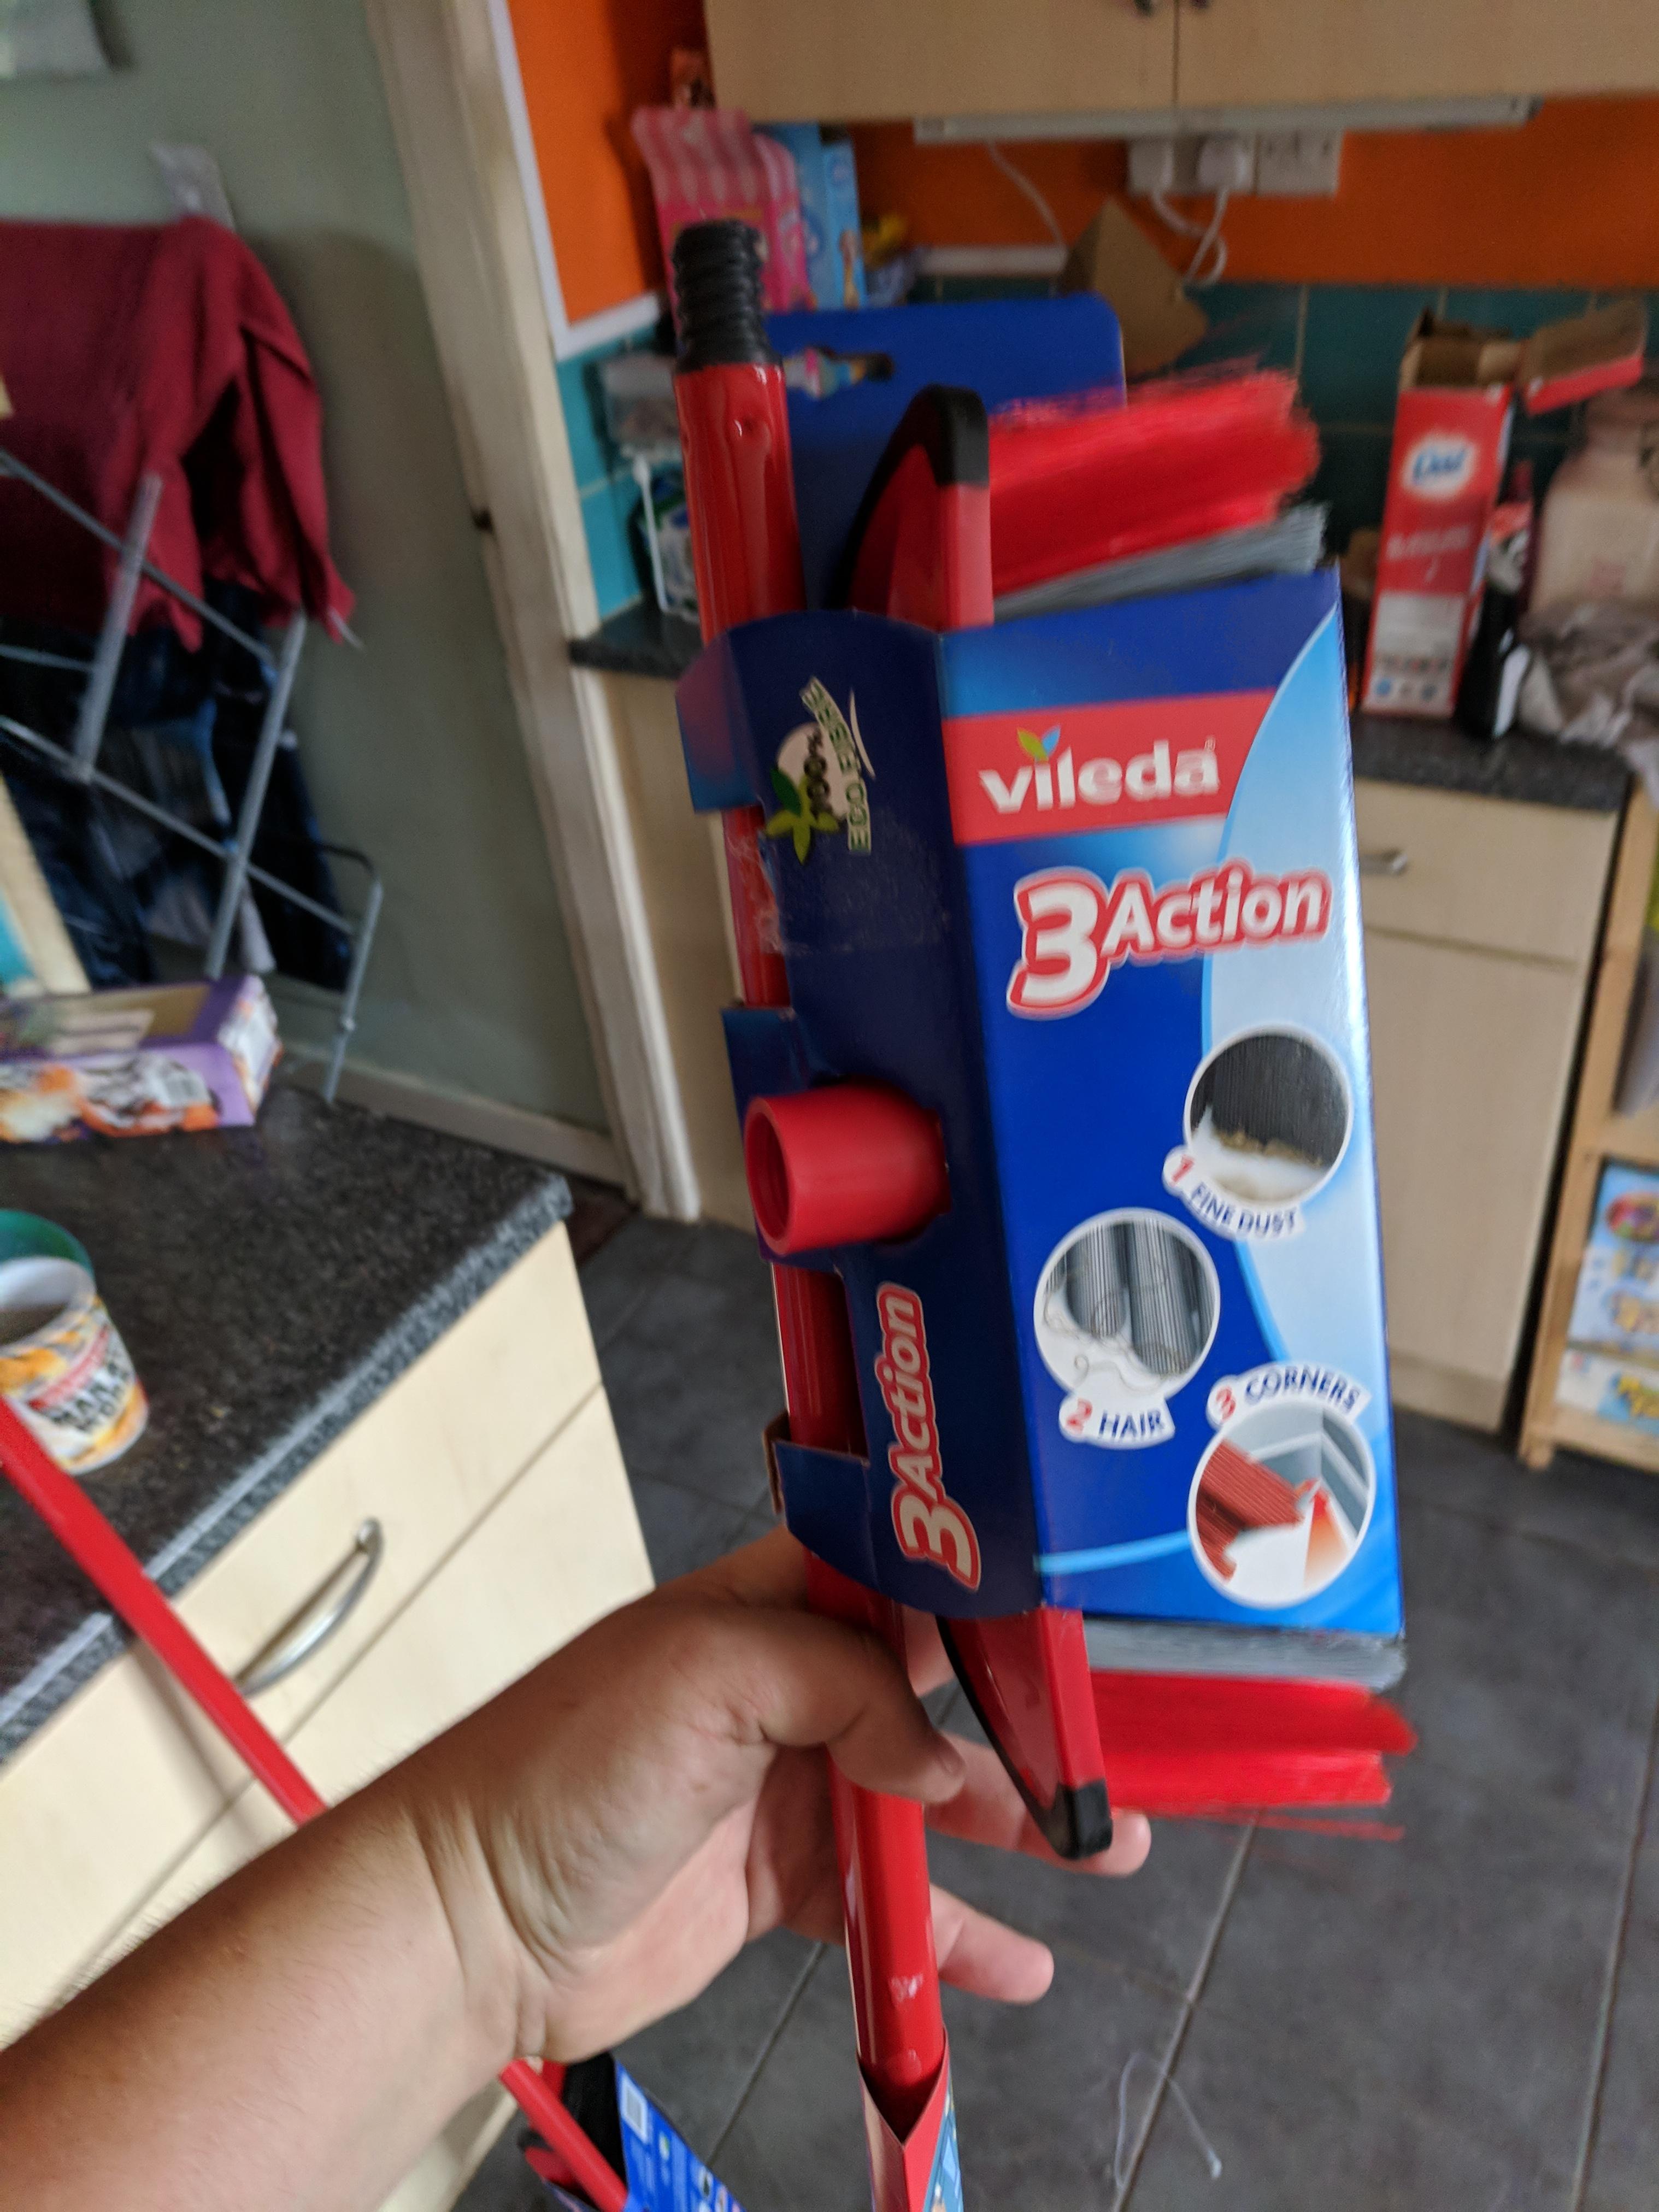 Vileda 3 Action Broom Red instore sutton in ashfiled asda- £2